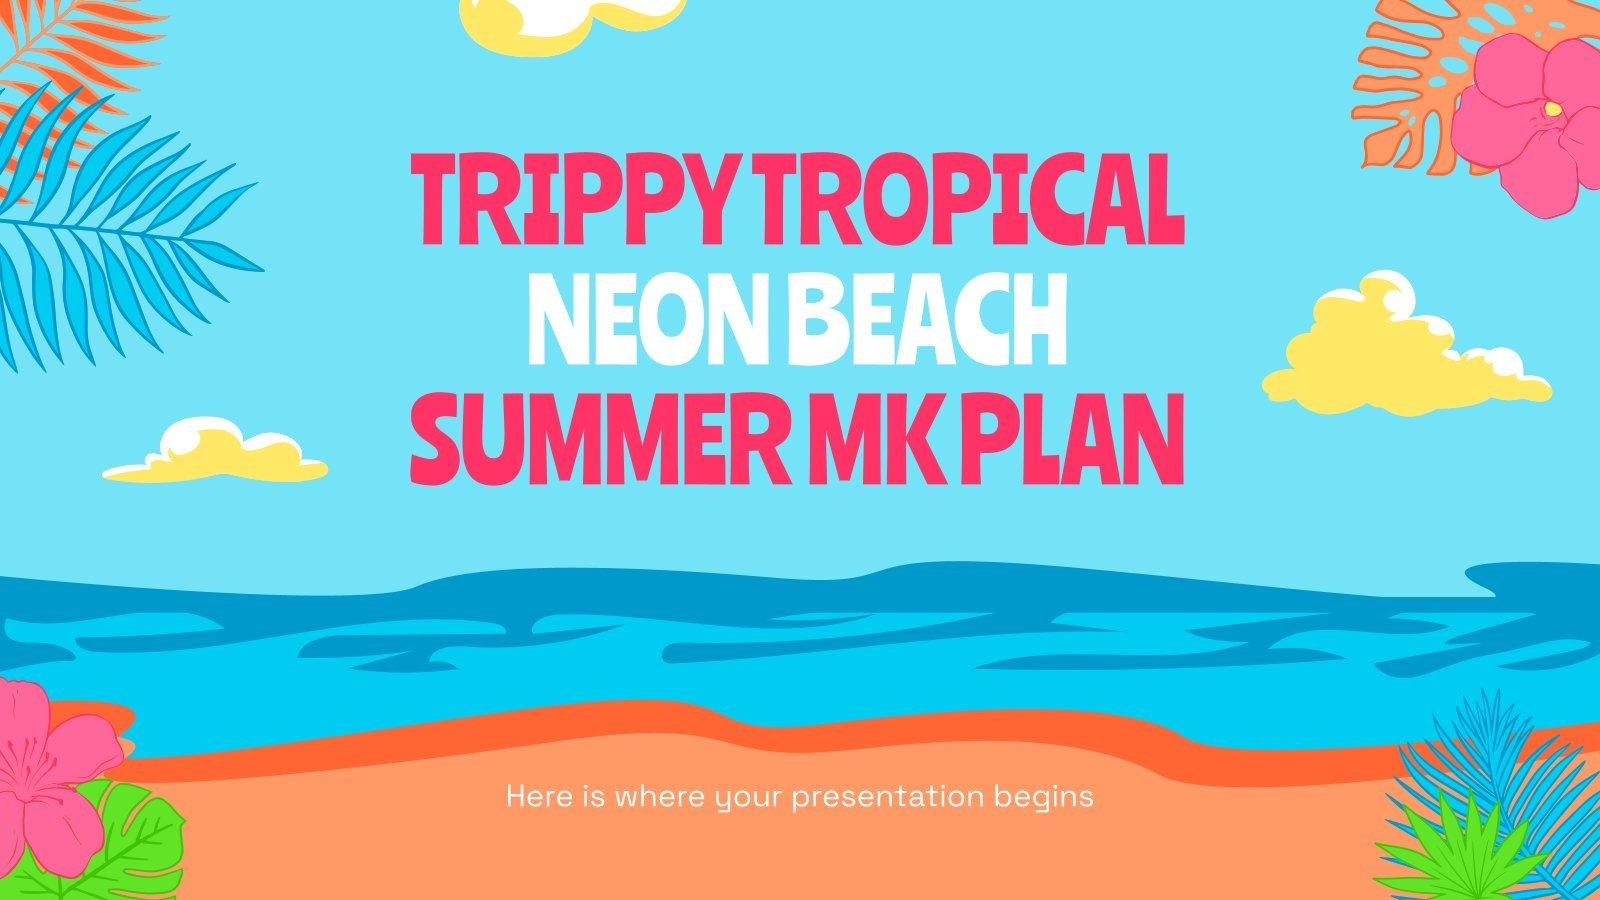 Trippy Tropical Neon Beach Summer MK Plan presentation template